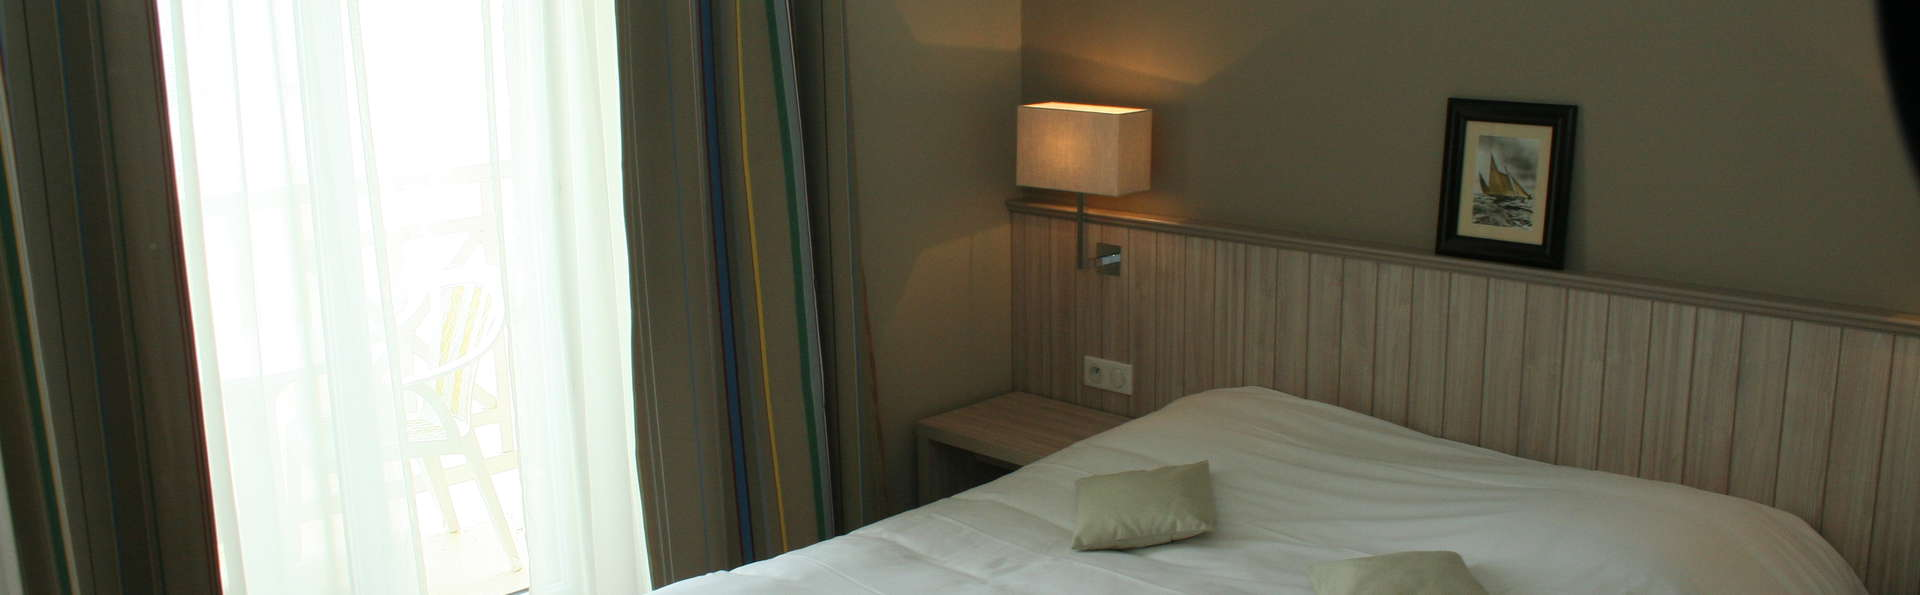 H tel antin a h tel de charme saint malo for Hotel saint malo jacuzzi chambre